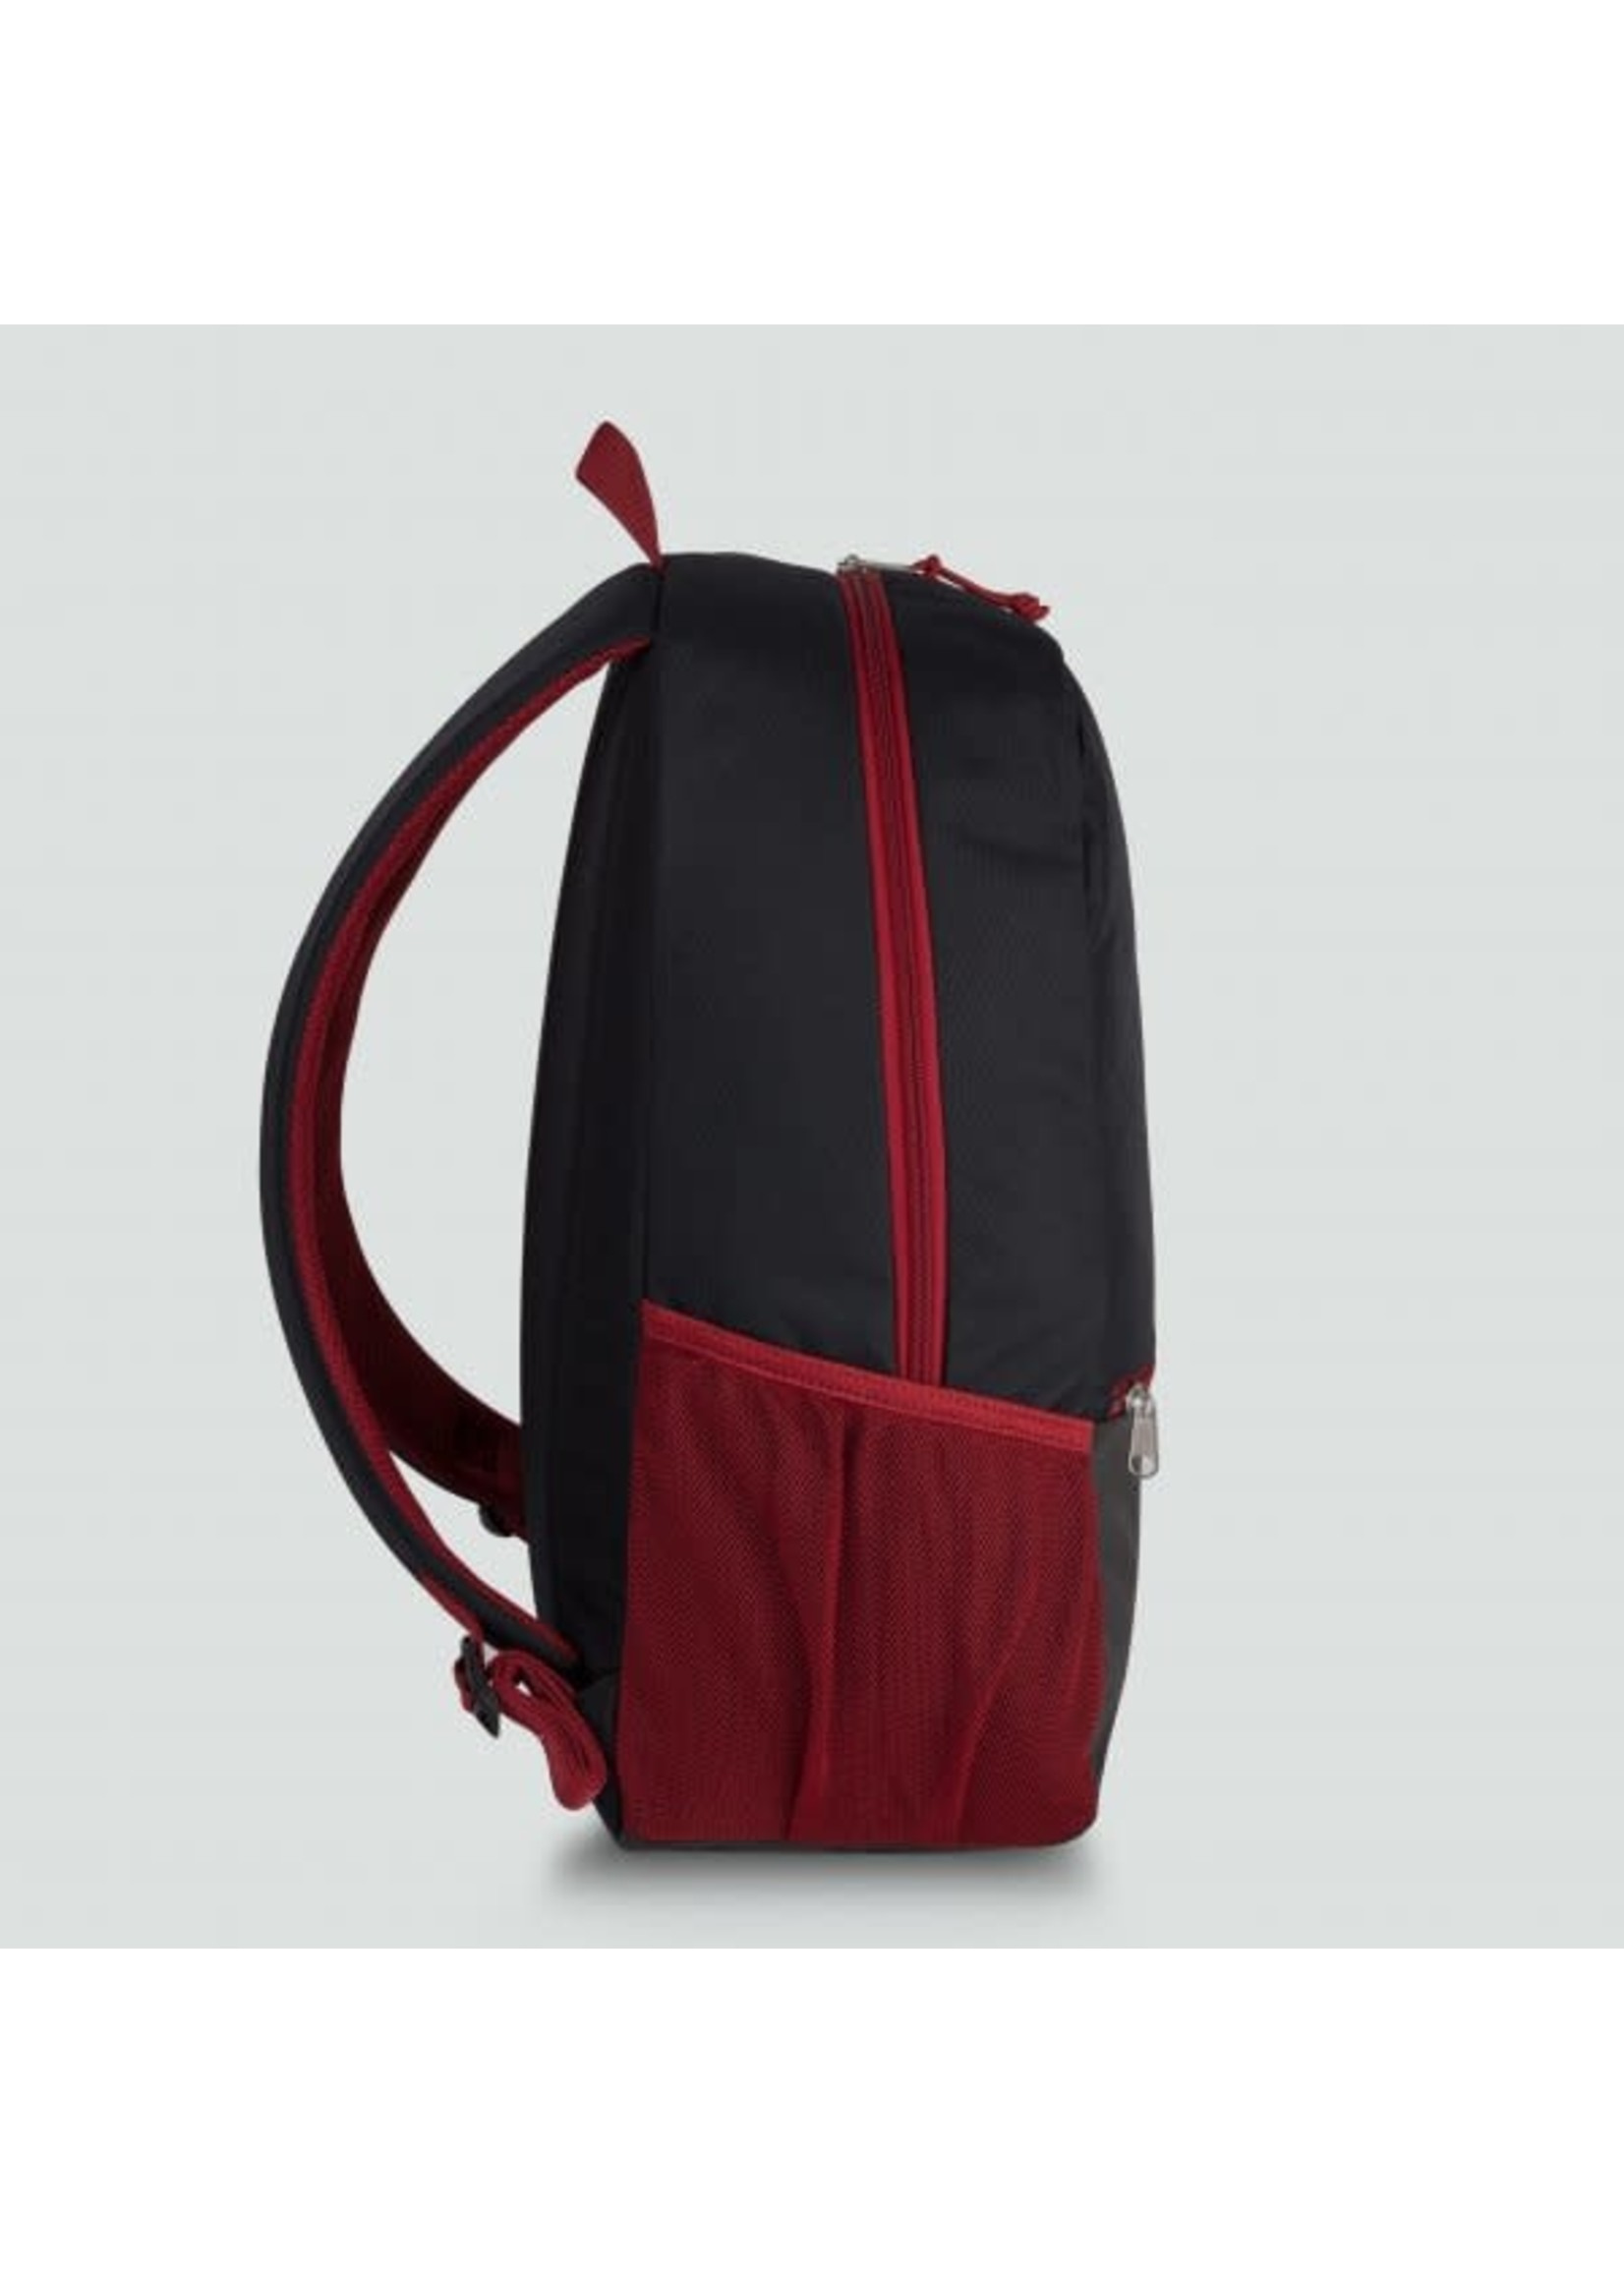 Canterbury Canterbury Medium Backpack - Black/Red (2020)